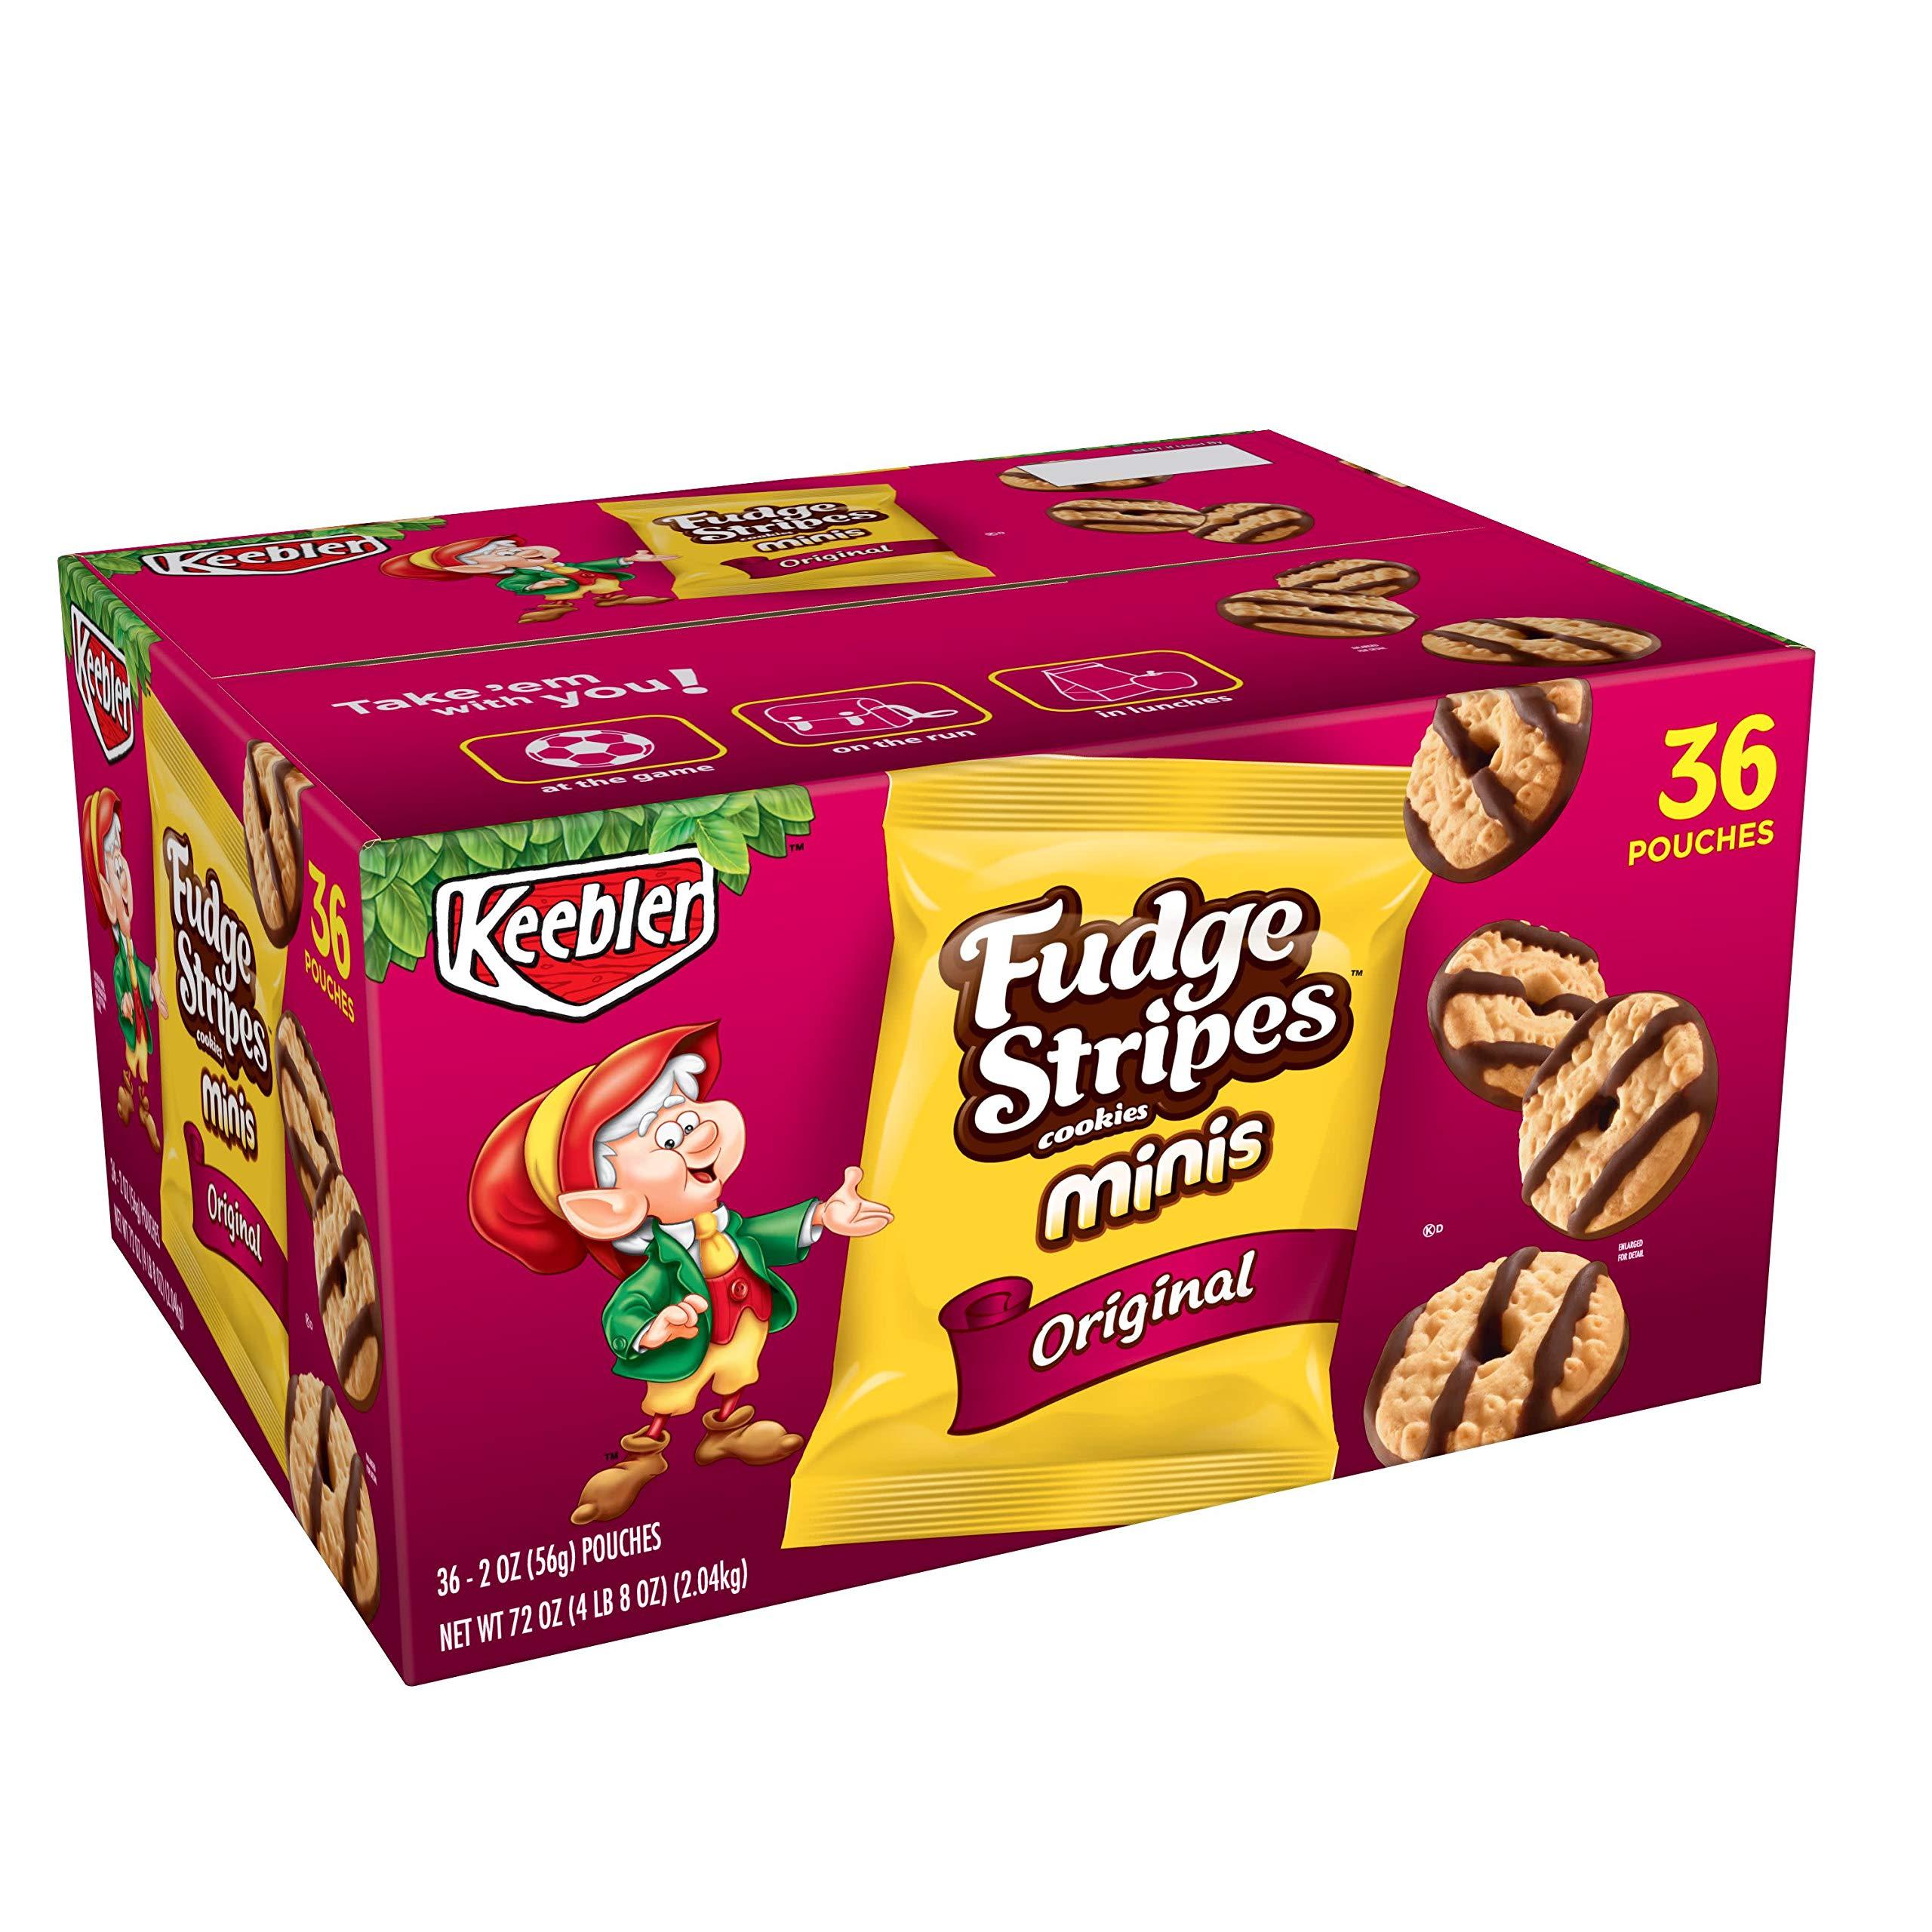 KeeblerFudge Stripes Cookies Minis, Original, 72 oz (36 Count)